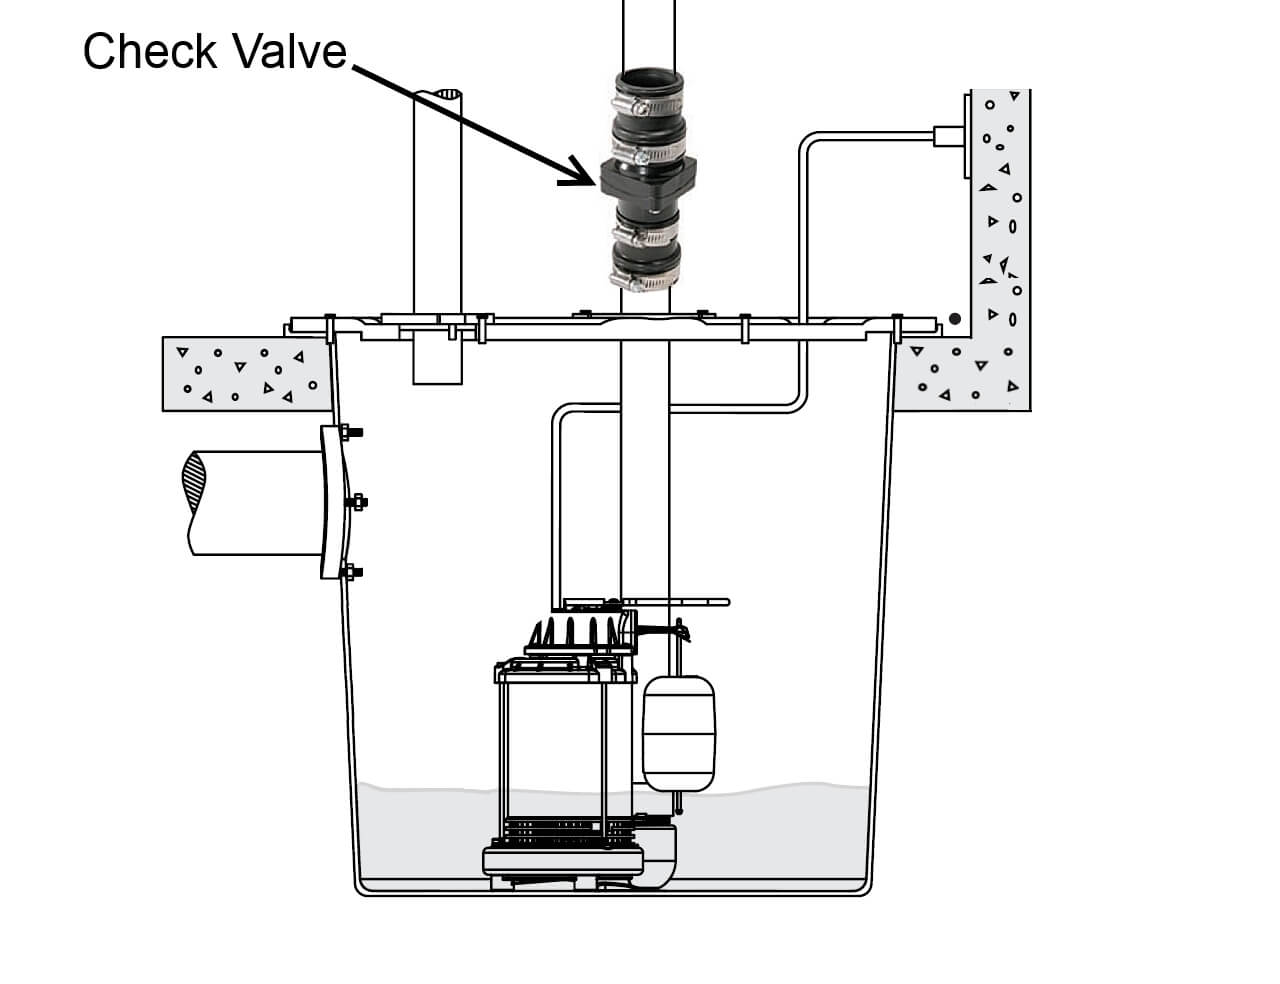 check valve plumbing diagram